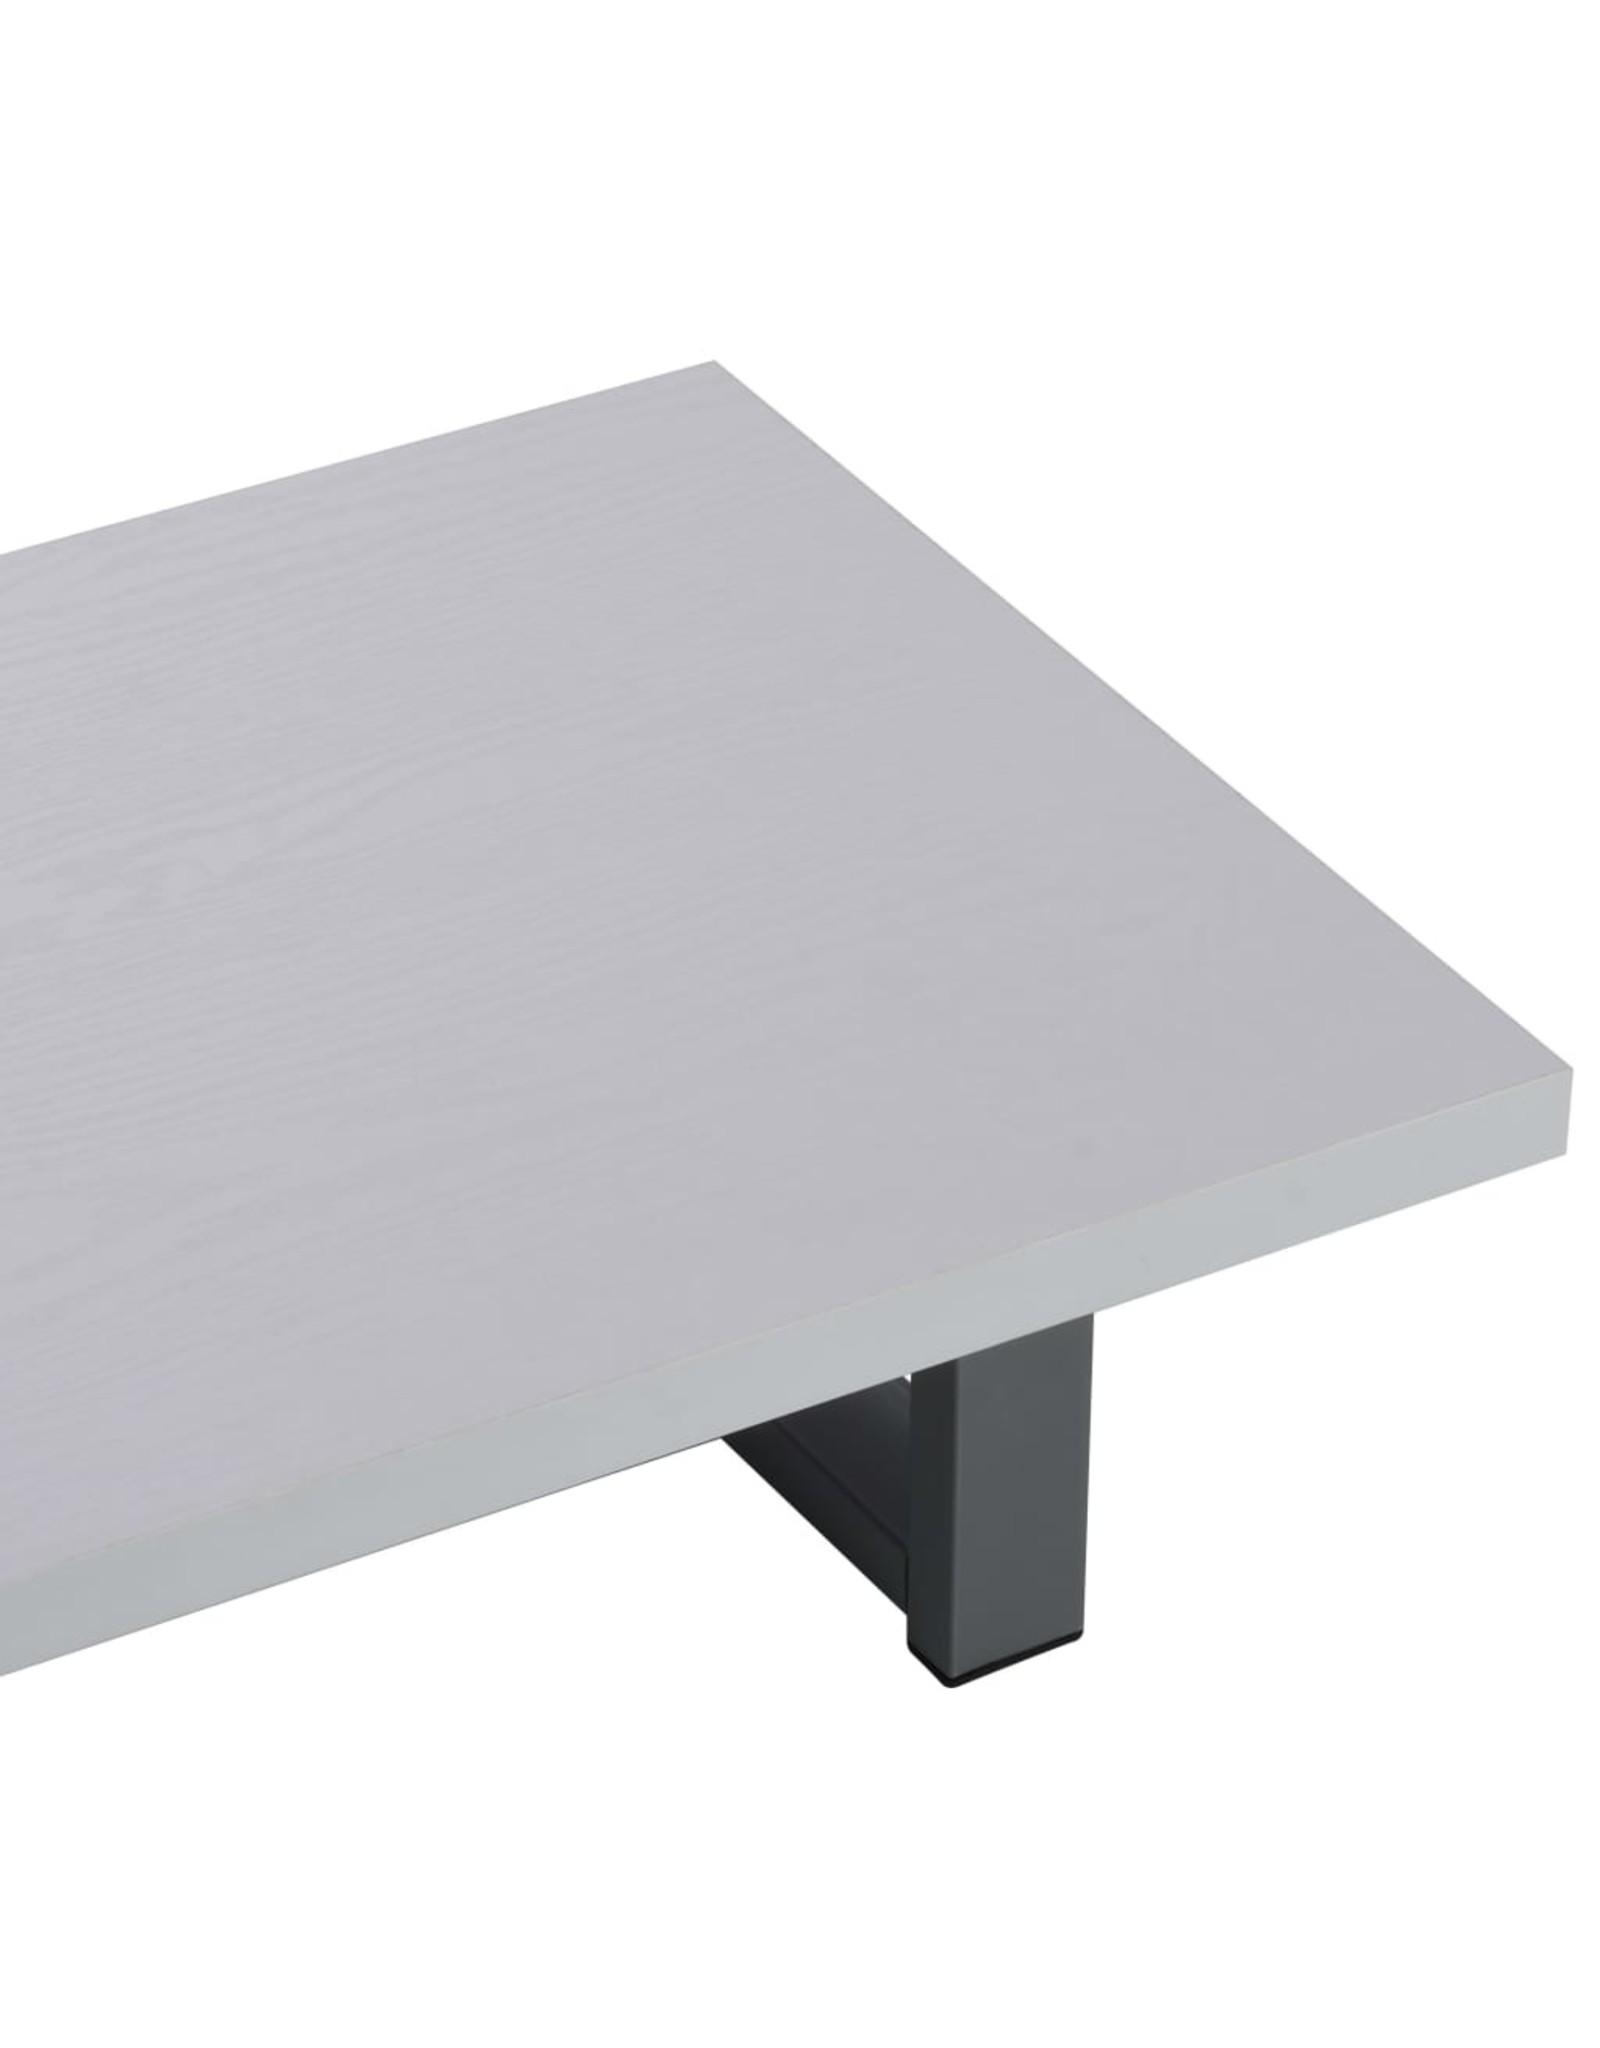 Badkamermeubel 60x40x16,3 cm wit